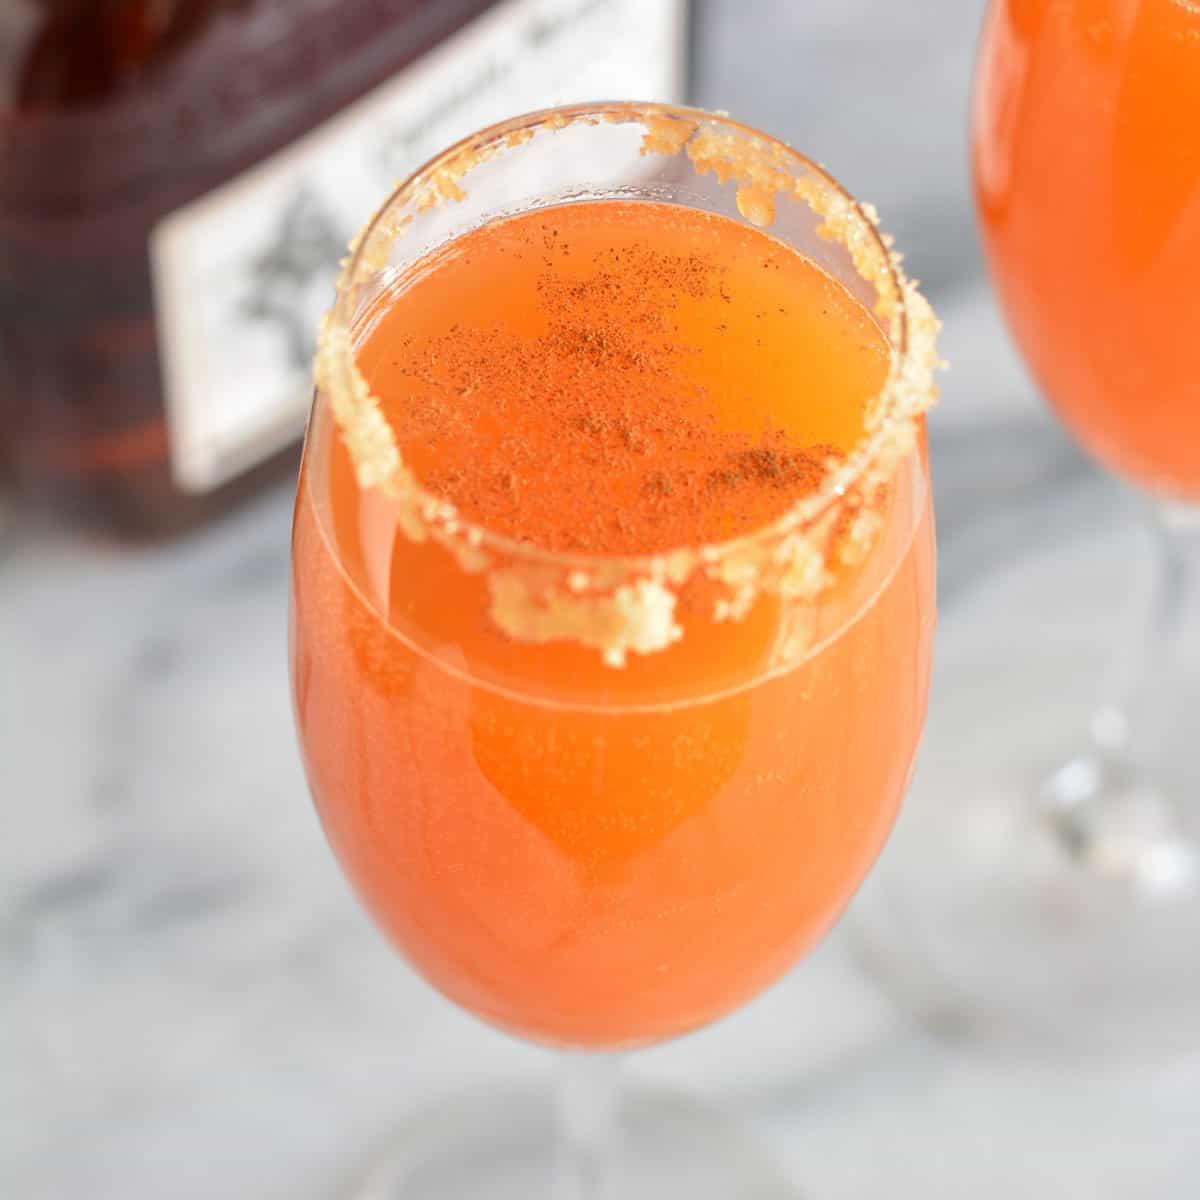 Pumpkin fizz drink in a glass